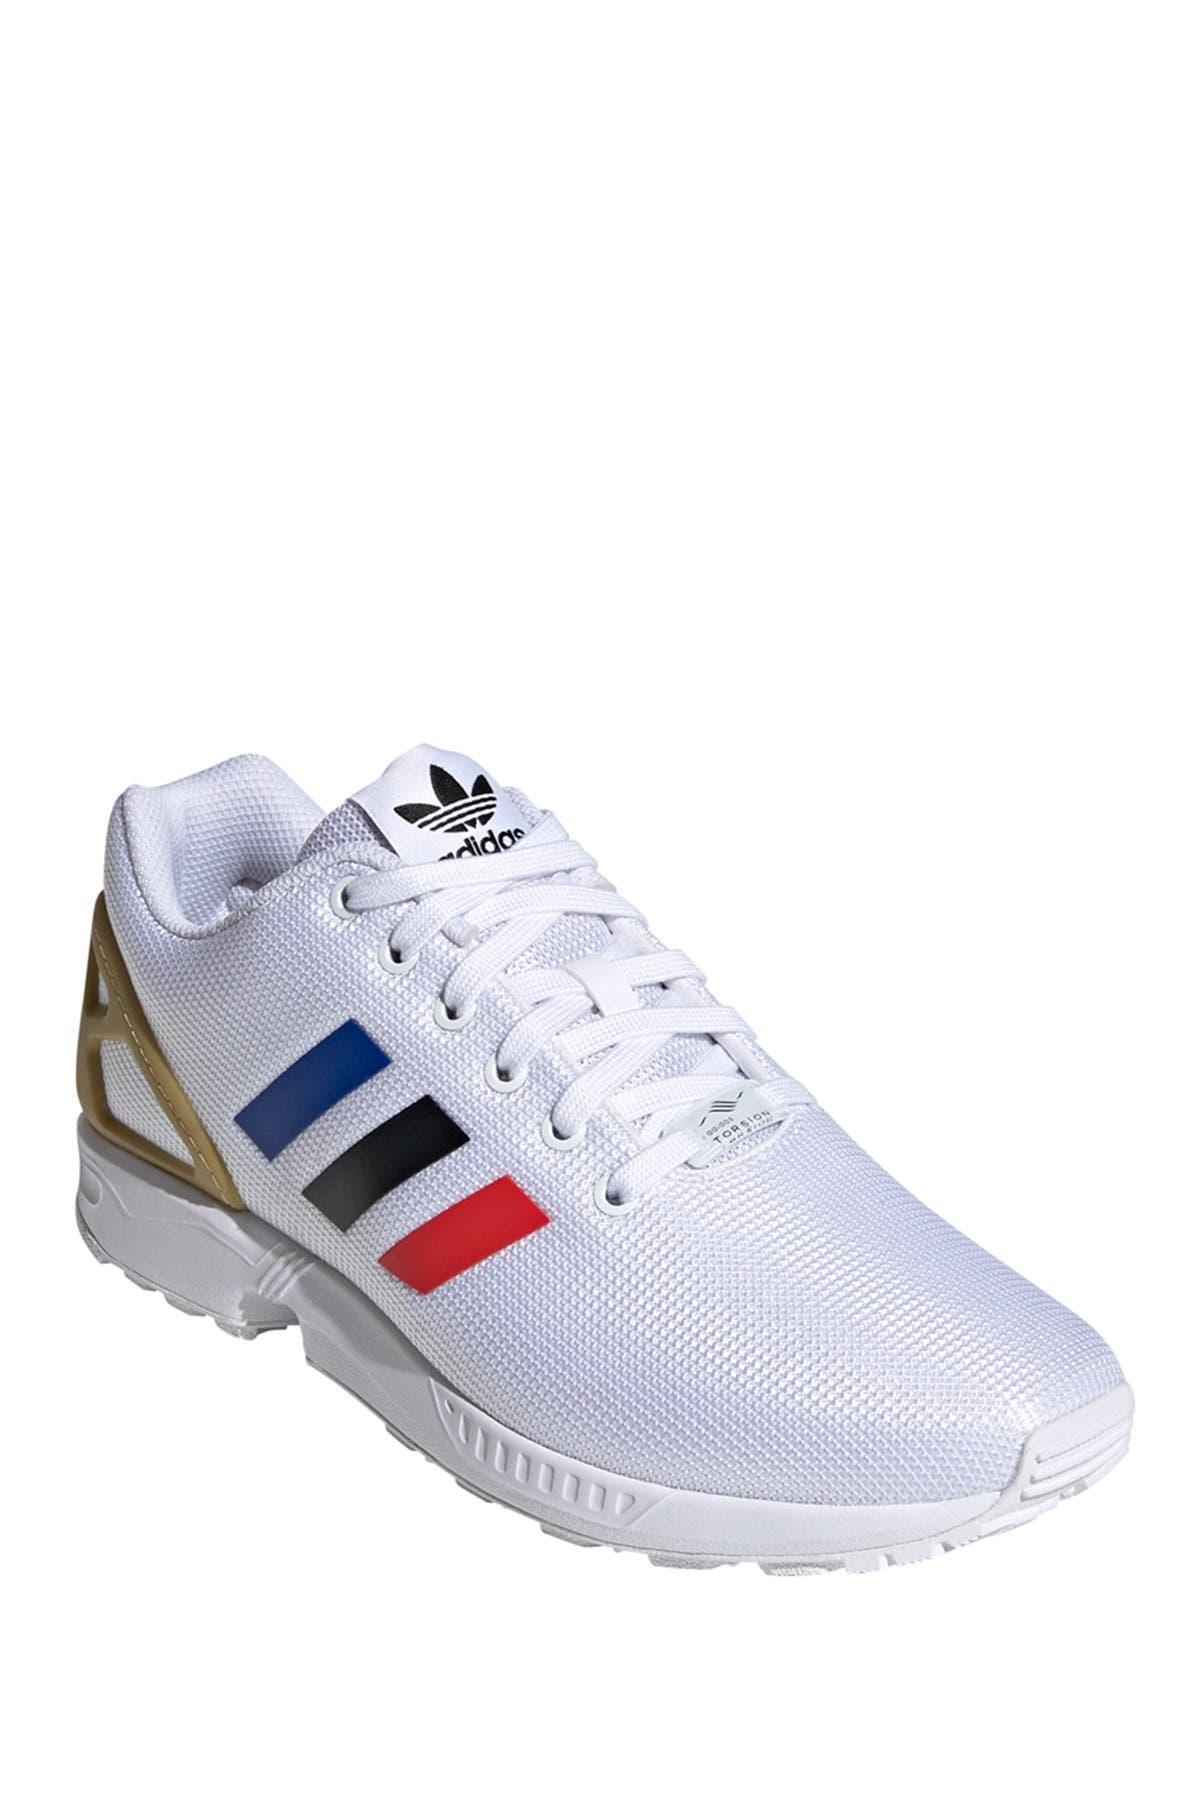 Image of adidas ZX Flux Sneaker